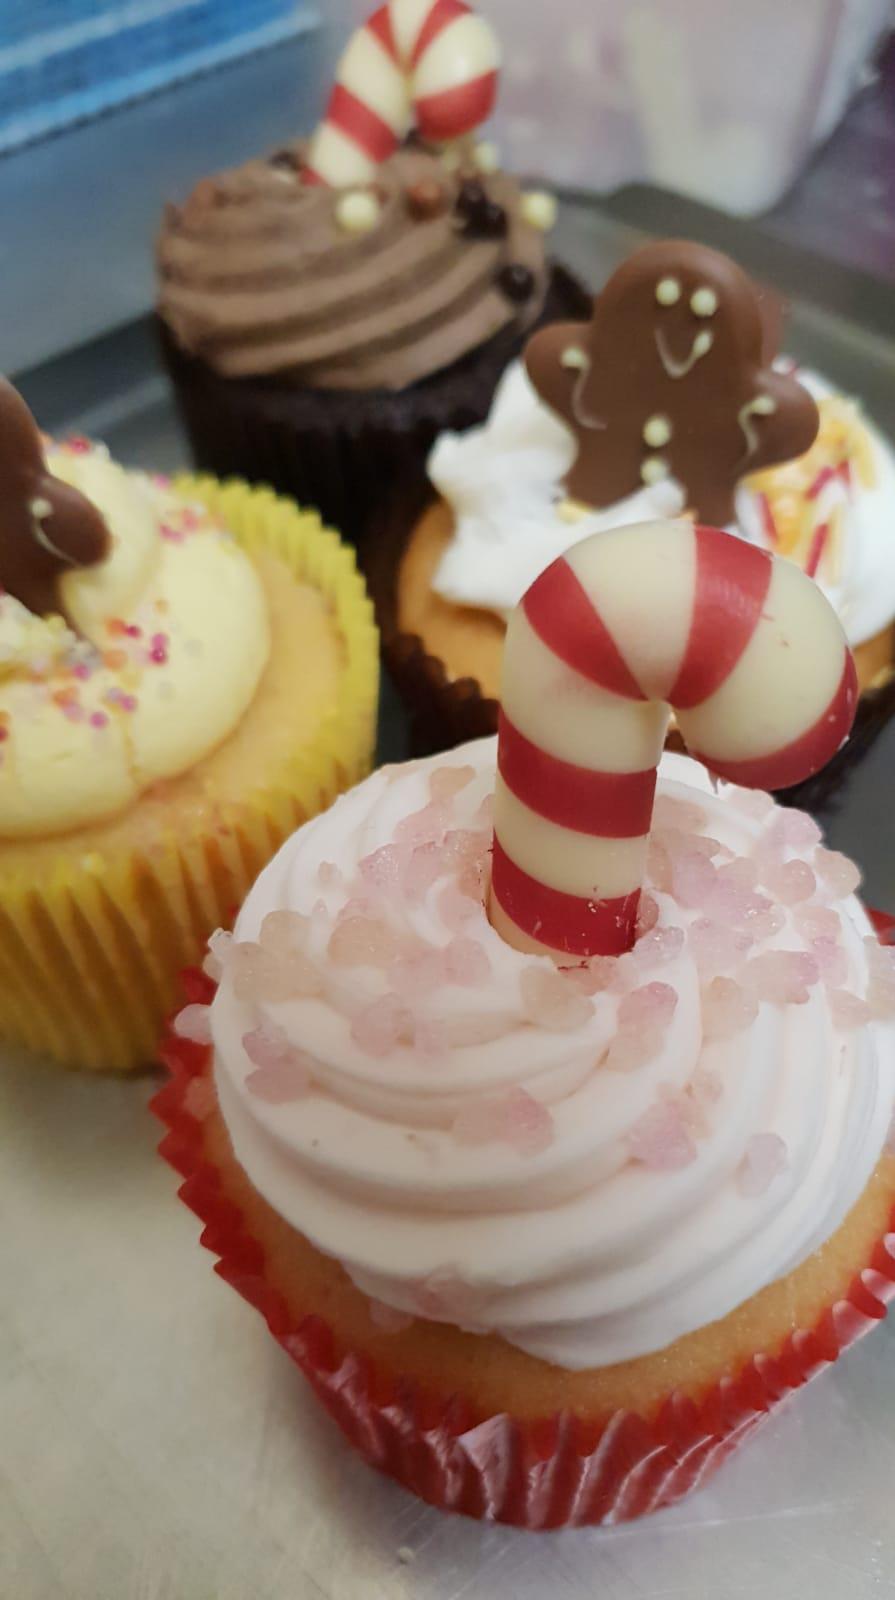 xmas shop - festive cupcakes 1